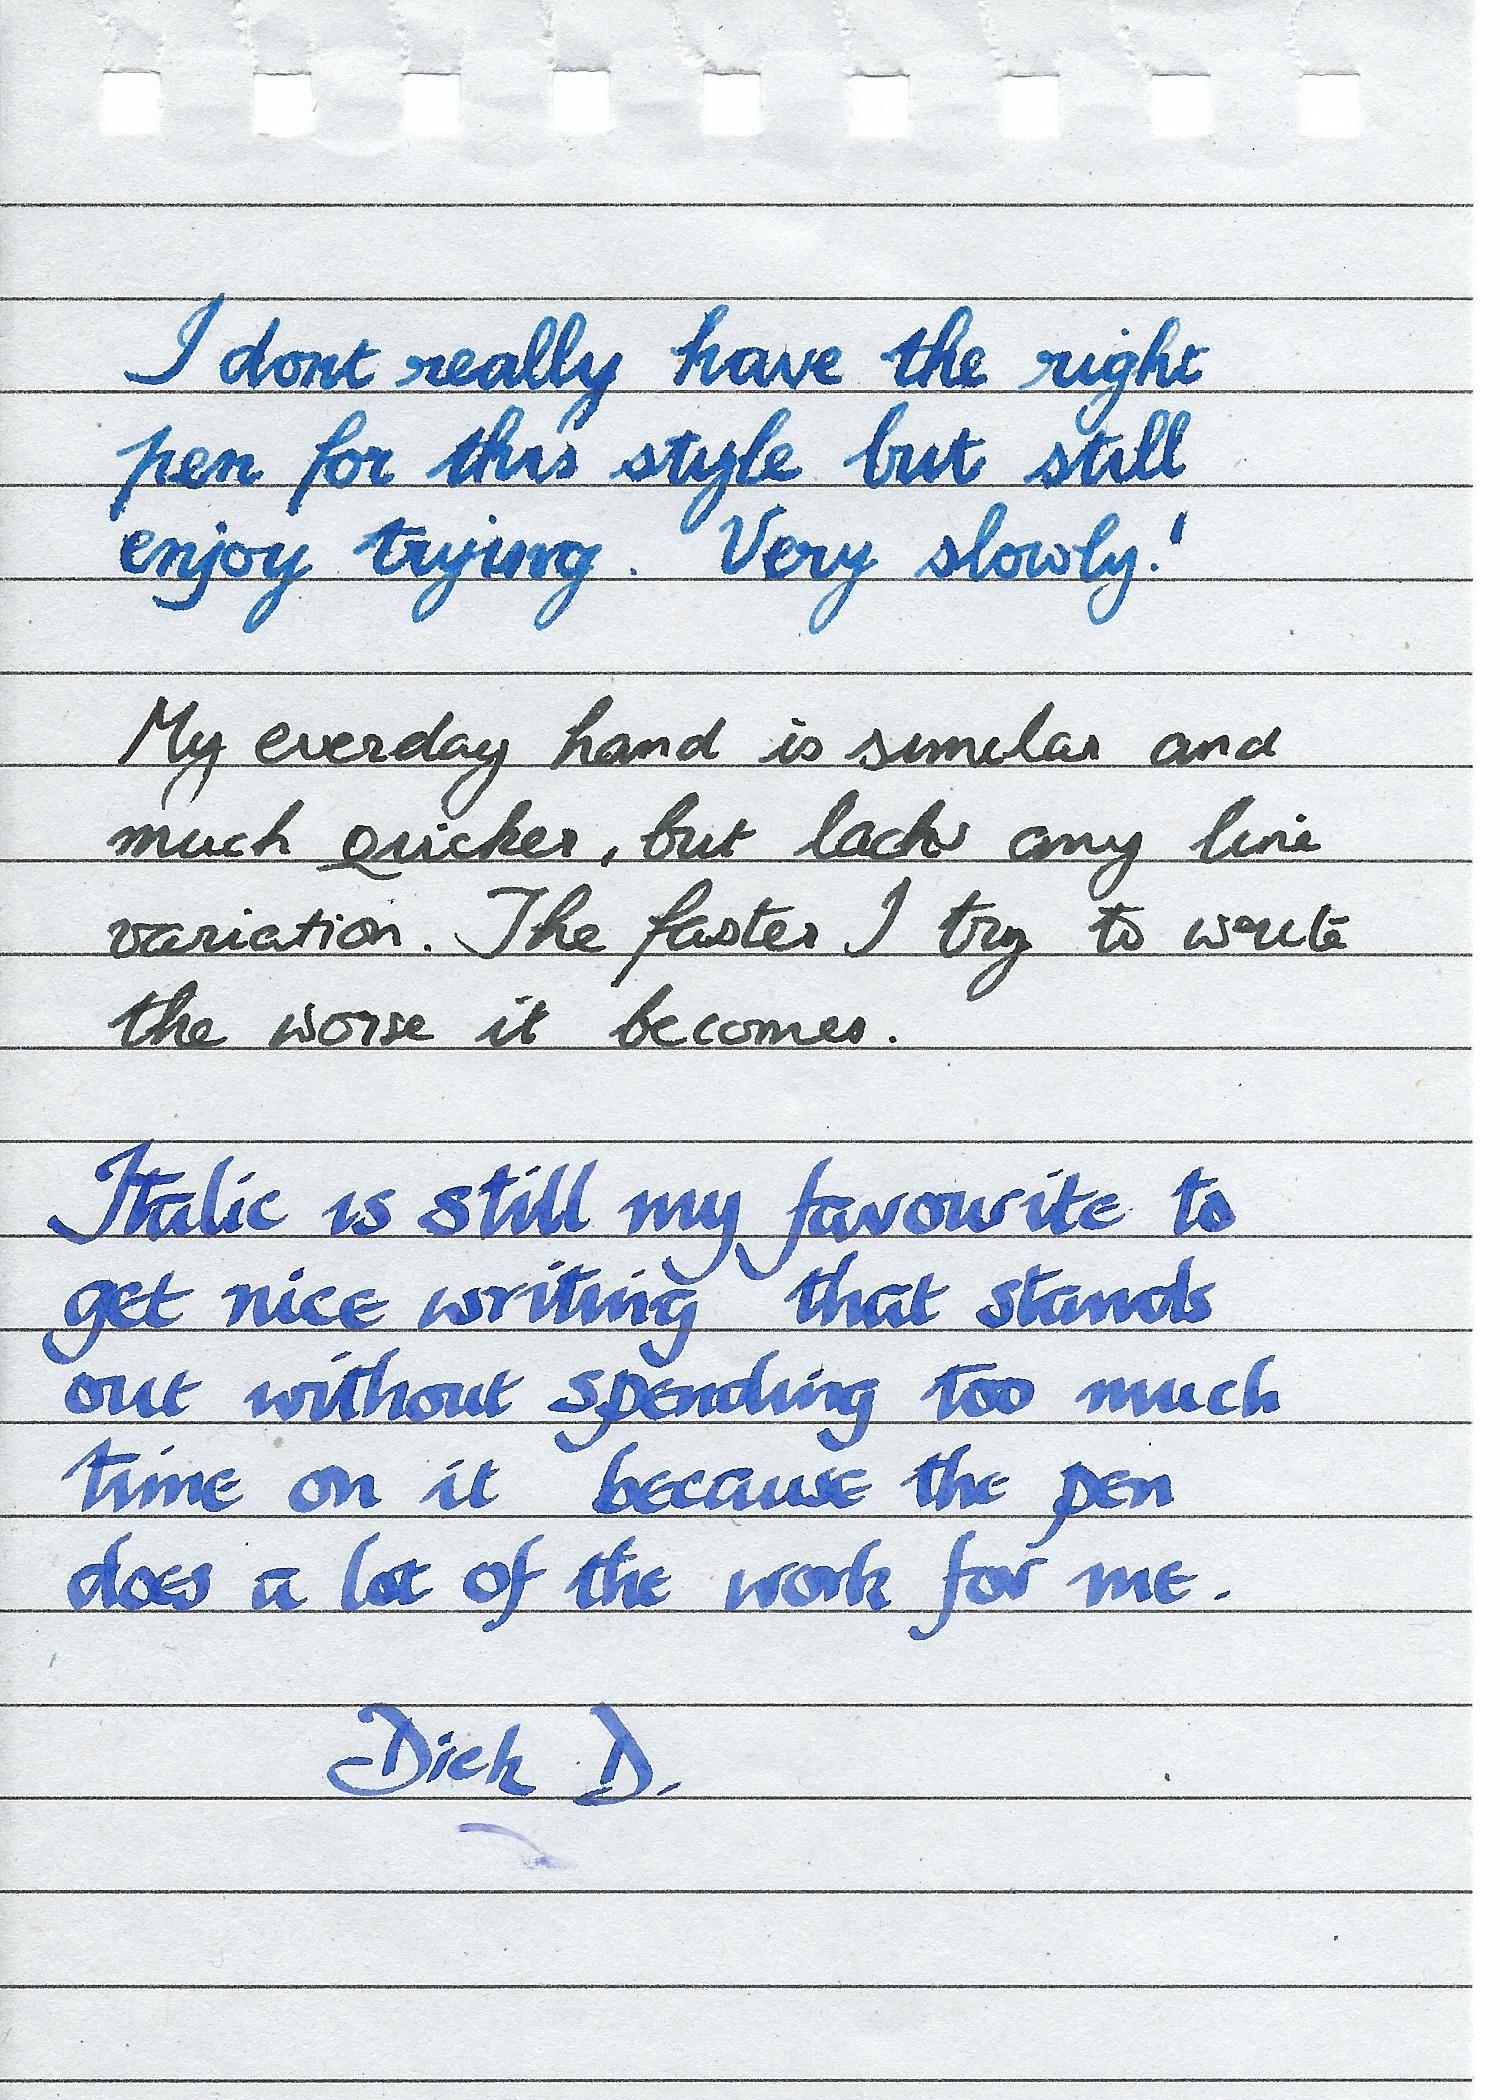 Pin By Dhenuka Sreenivasan On Handwriting Samples